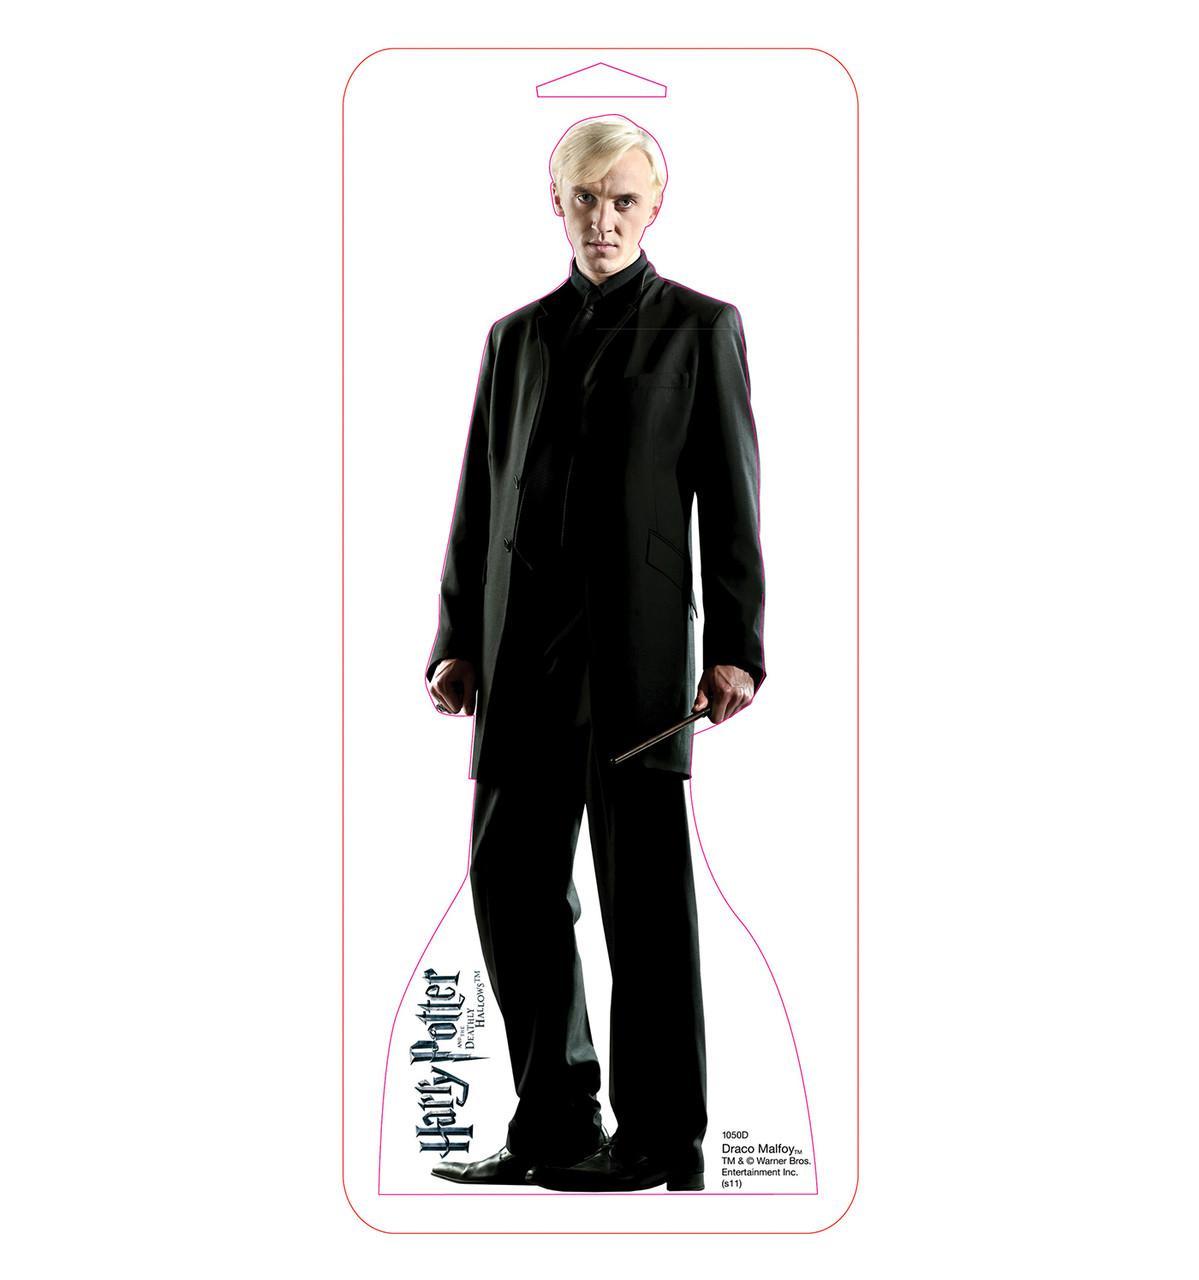 Tabletop Draco Malfoy Mini Cardboard Standup | Cardboard Cutout